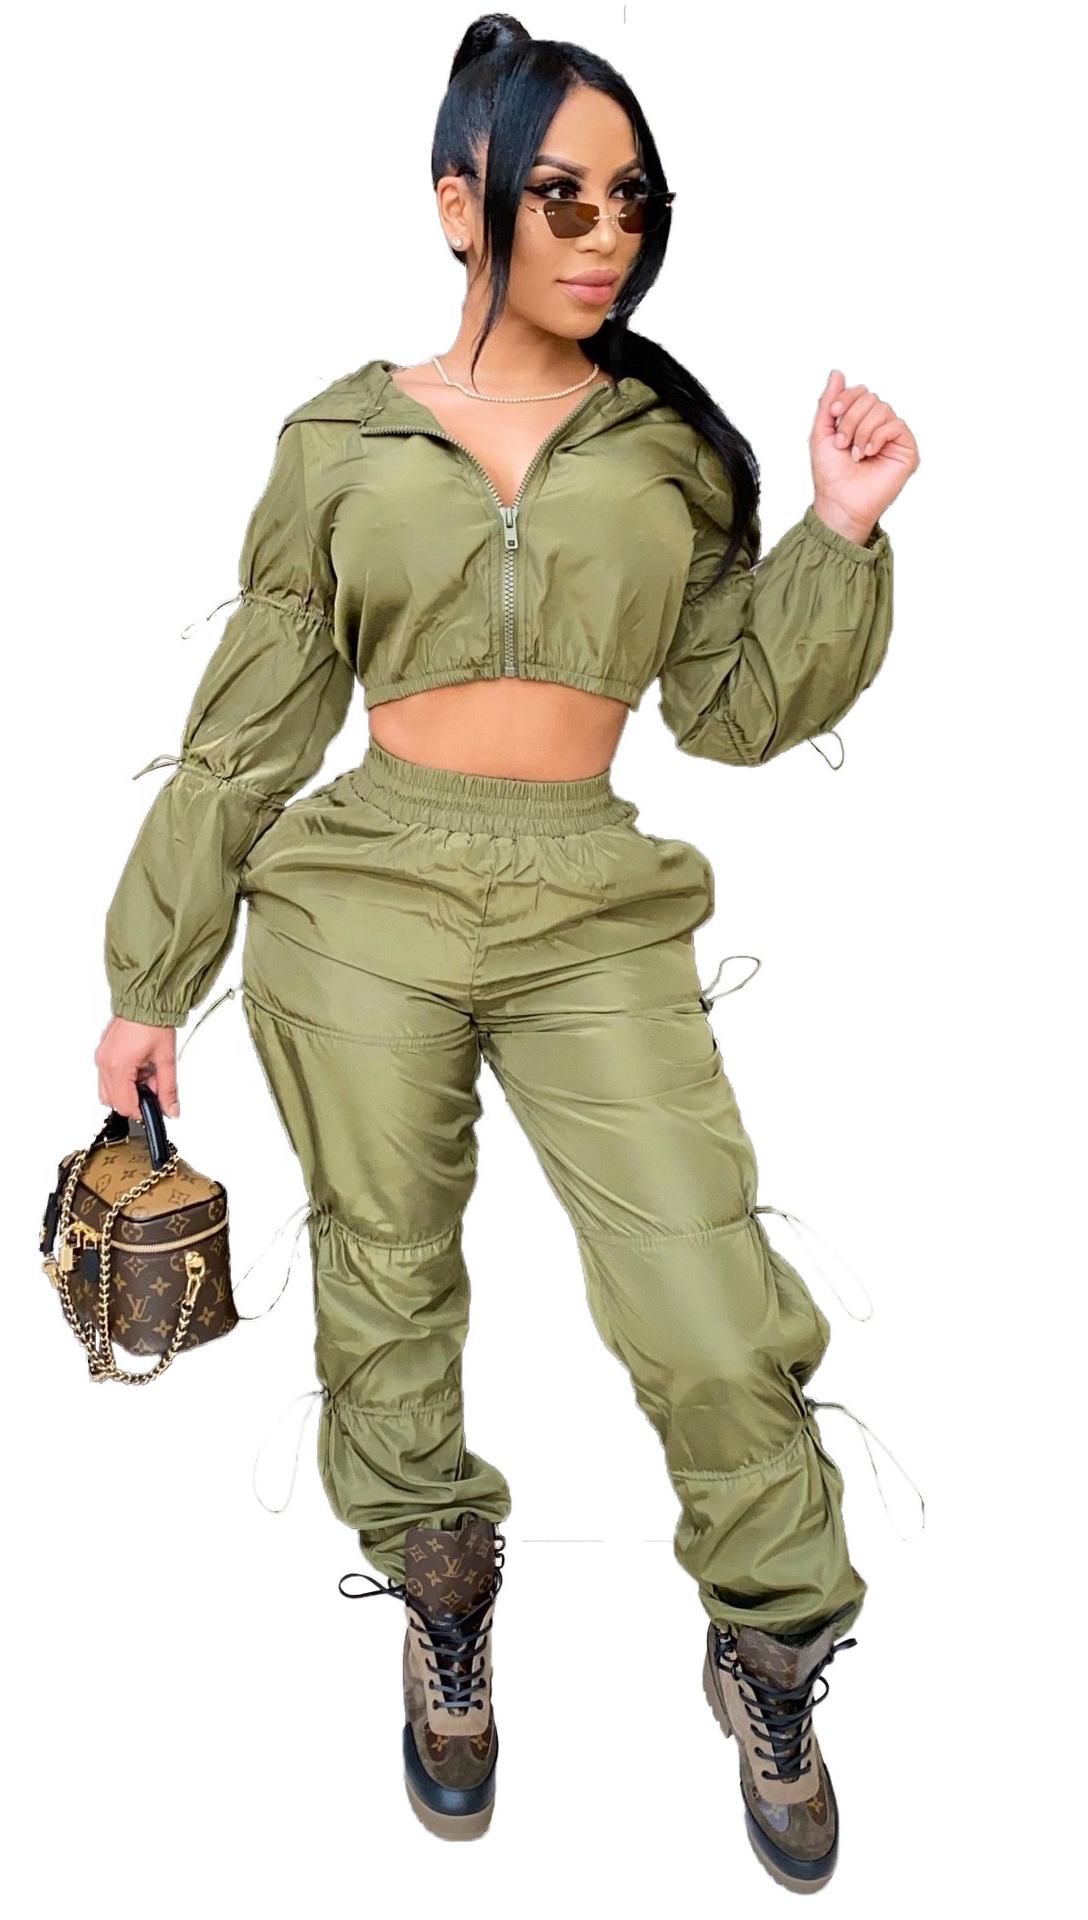 Plus size Long sleeved elastic trousers drawstring crop top jumpsuit women two piece leggings set DMCY1264